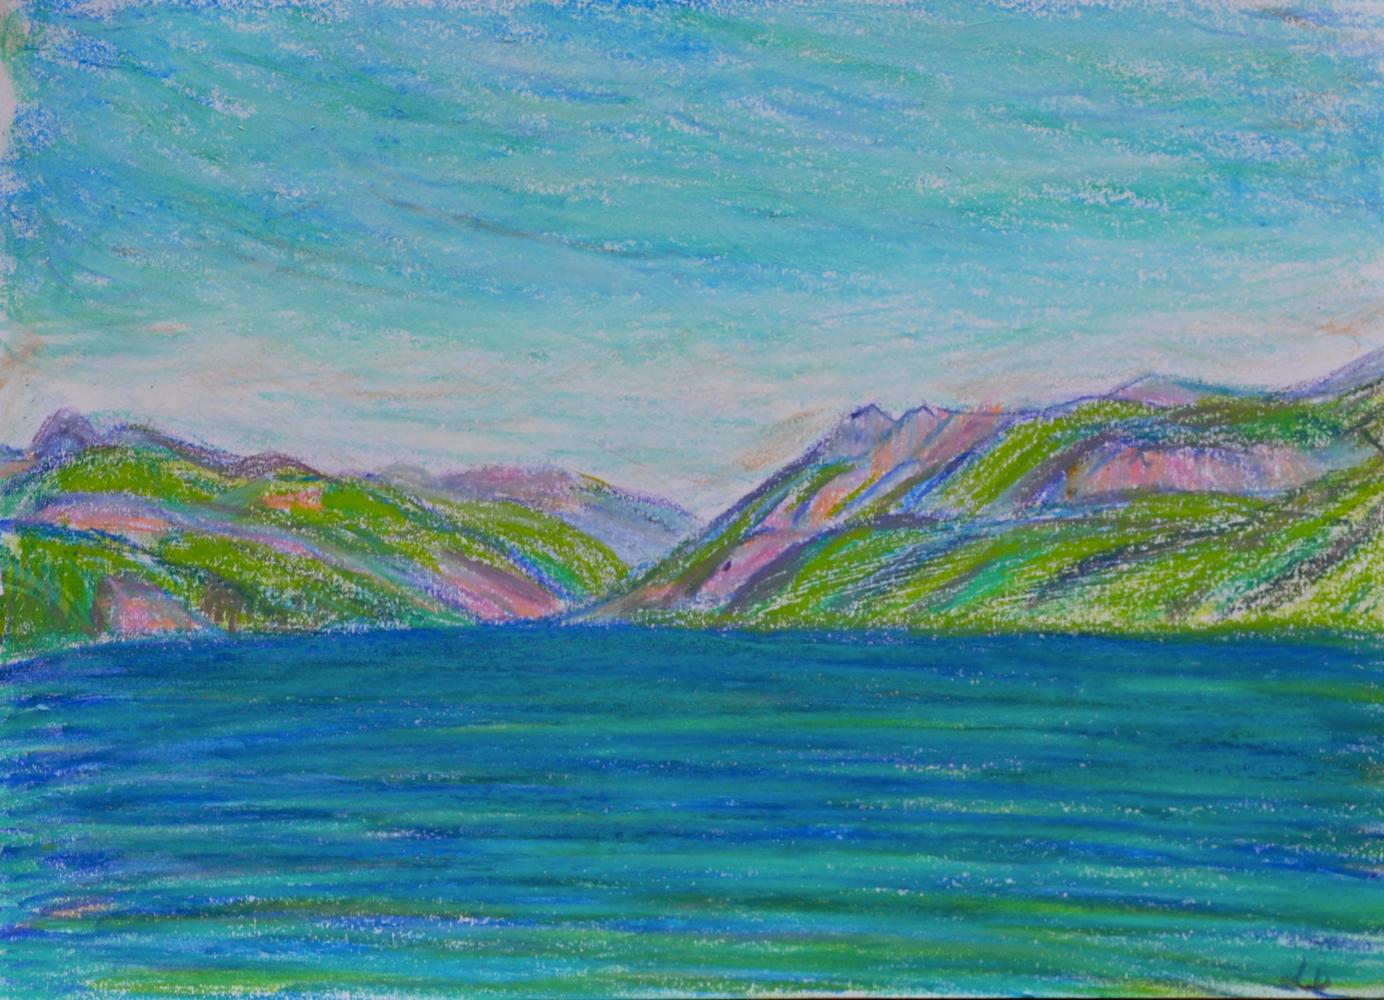 Lake Geneva, St Prex no. 6. Mixed media on paper, 21x30, 2018